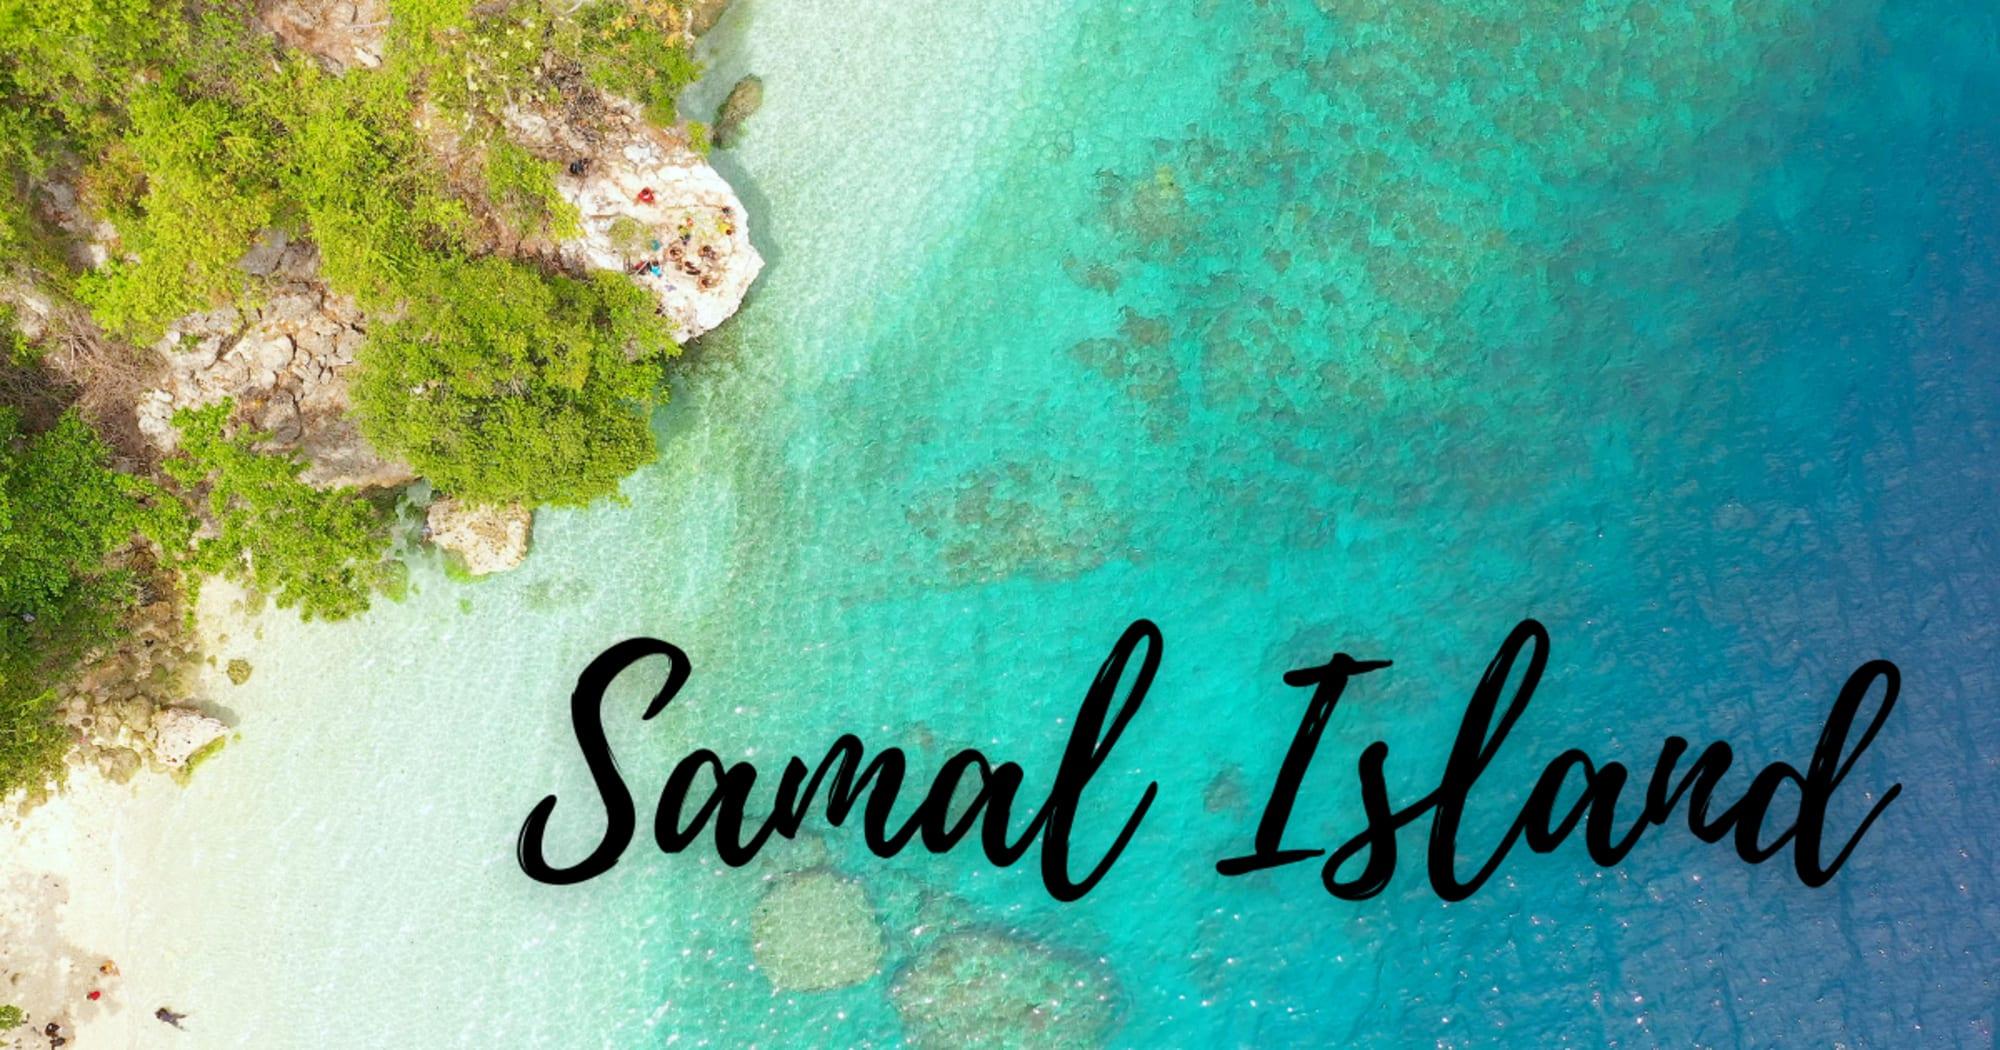 The DOT will conduct an investigation of a resort in Samal Island regarding gender discrimination